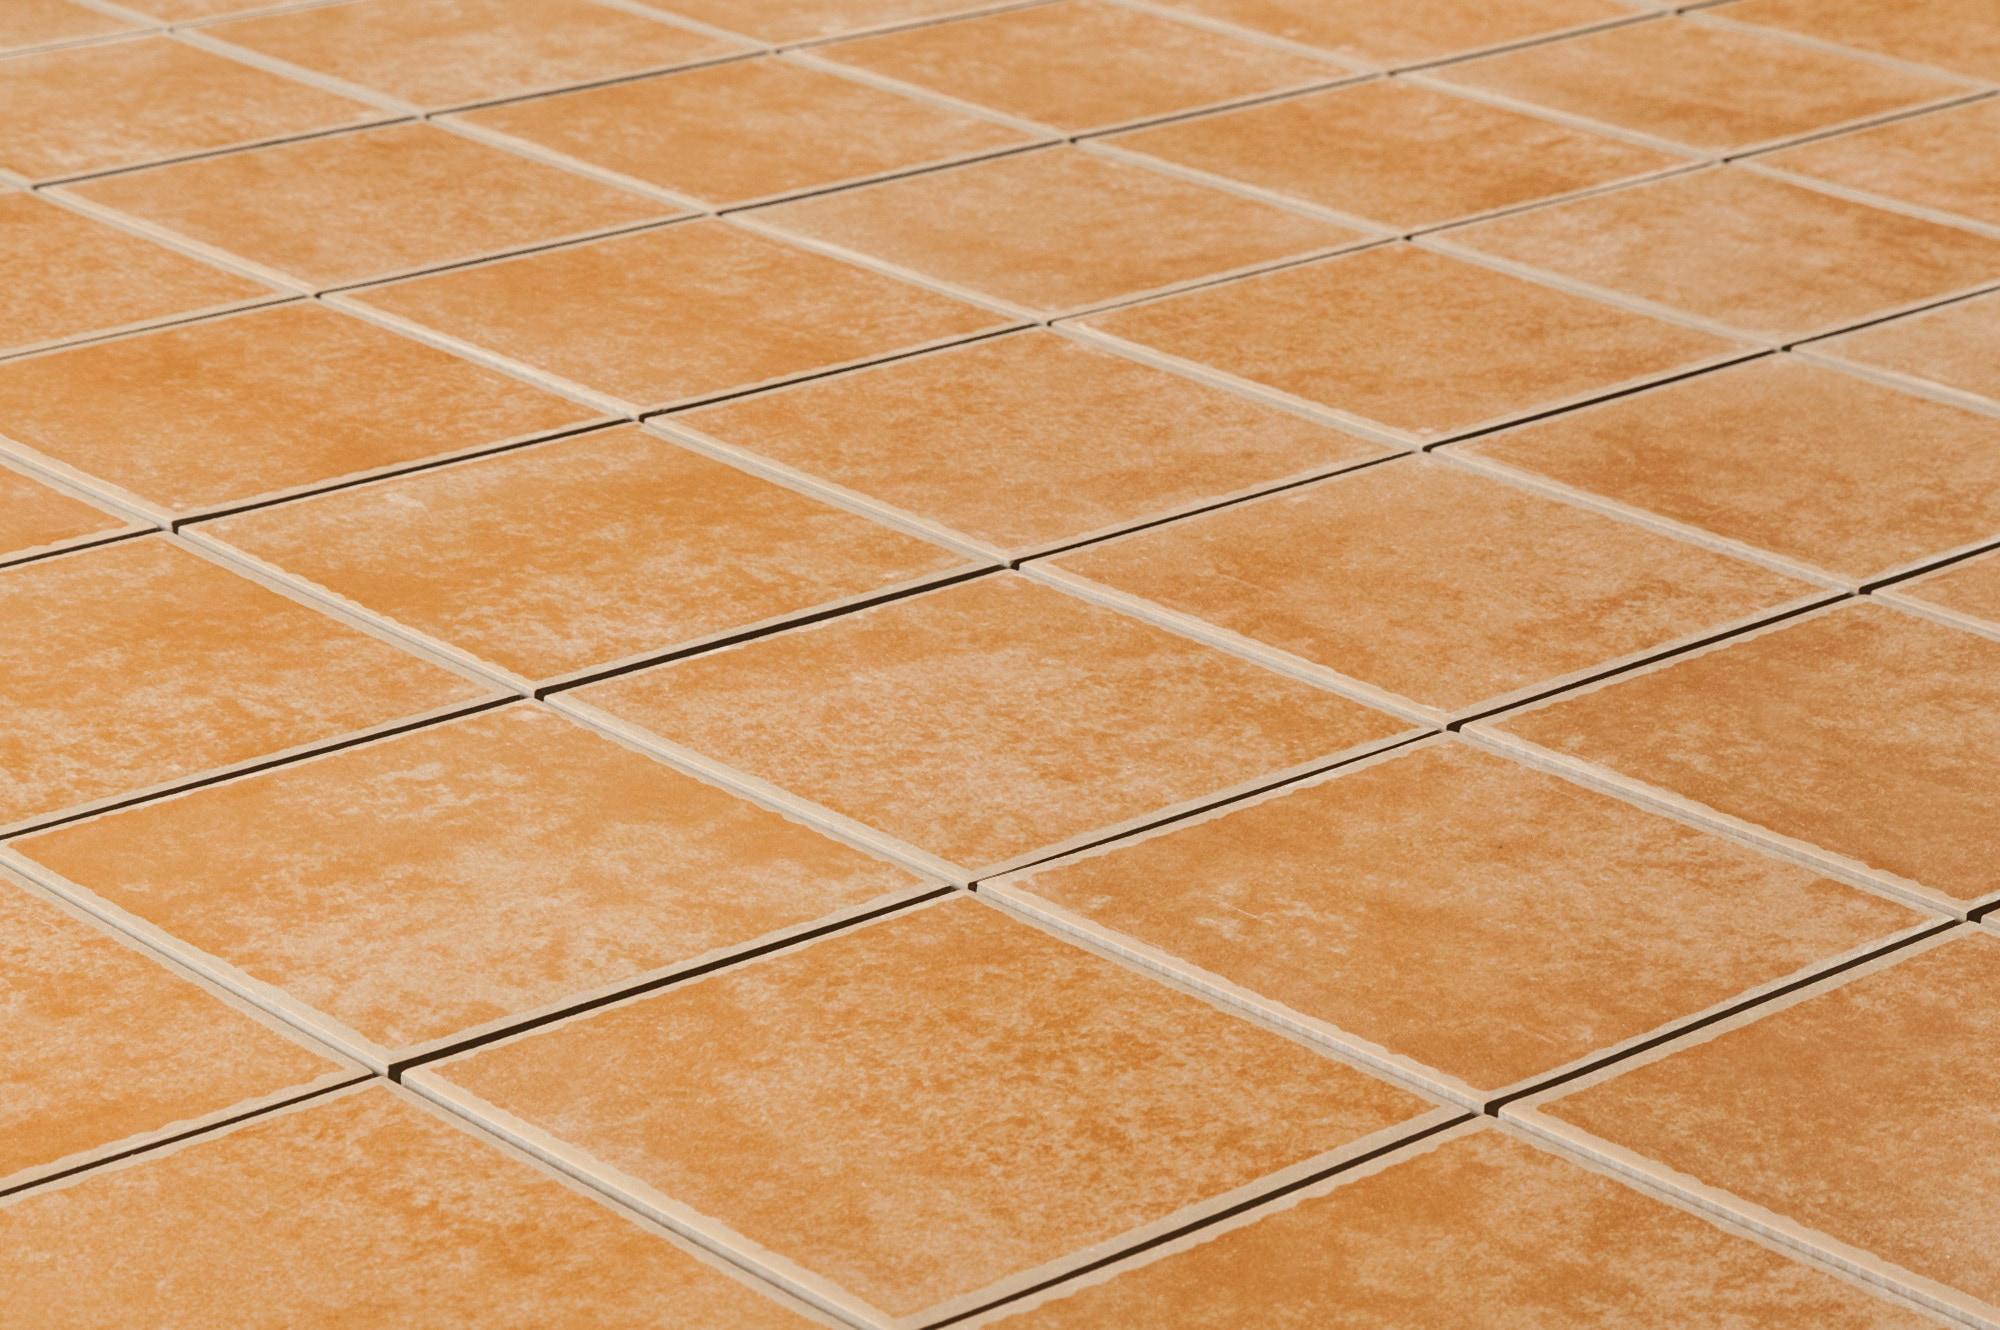 Kontiki interlocking deck tiles elements fire series sedona red 12 x12 x1 slab - How to install interlocking deck tiles ...